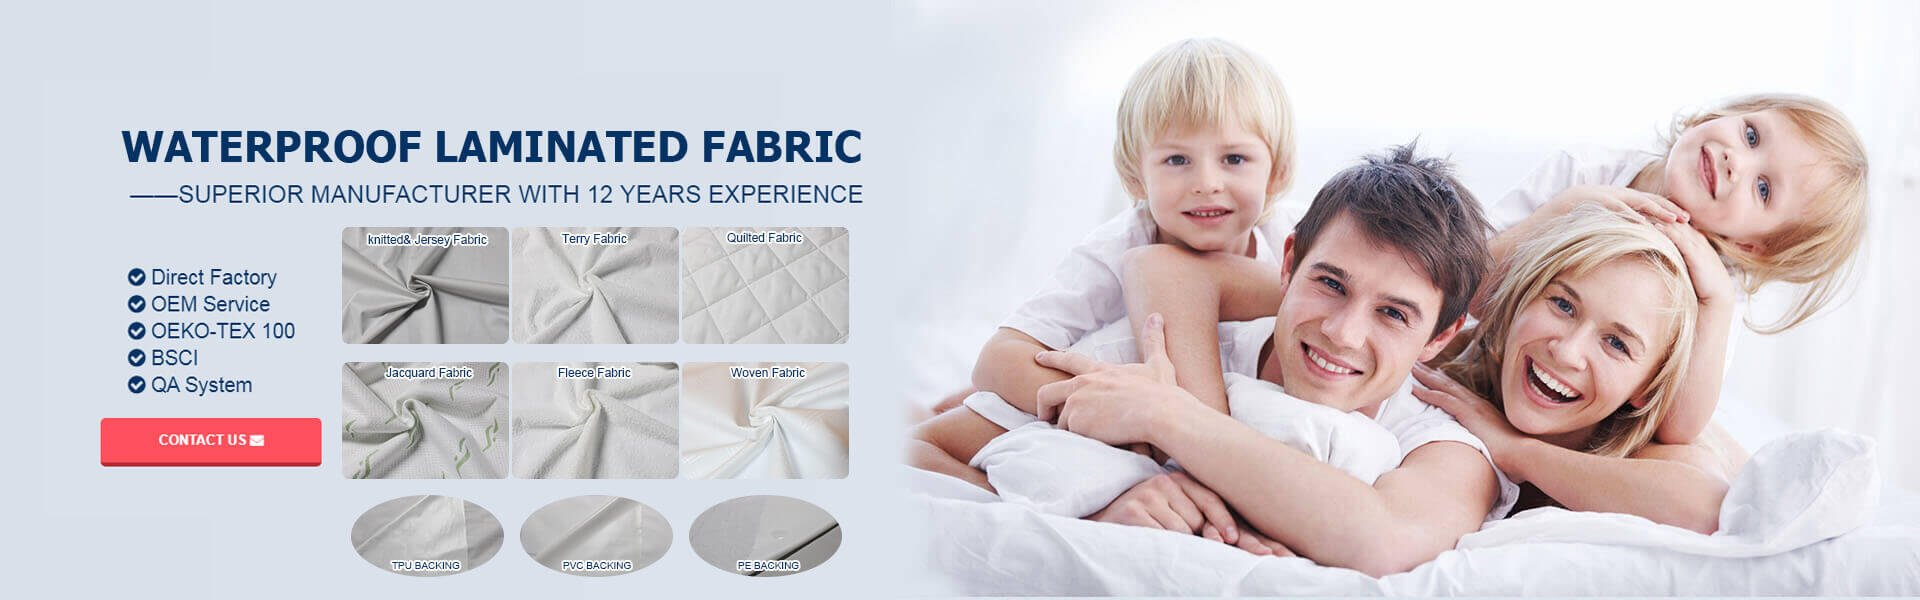 waterproof fabric manufacturer